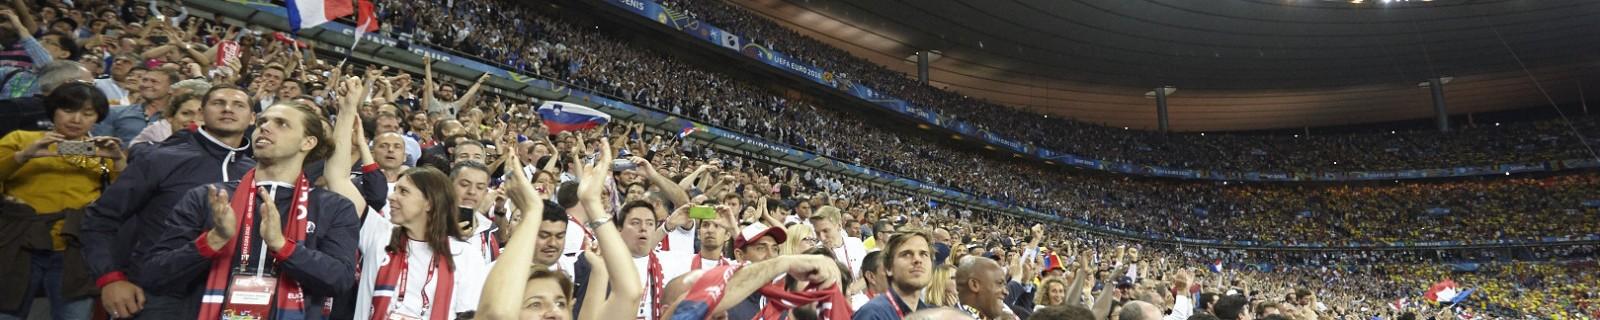 CORPORATE EVENTS: UEFA EURO 2016 KIA HOSPITALITY PROGRAM